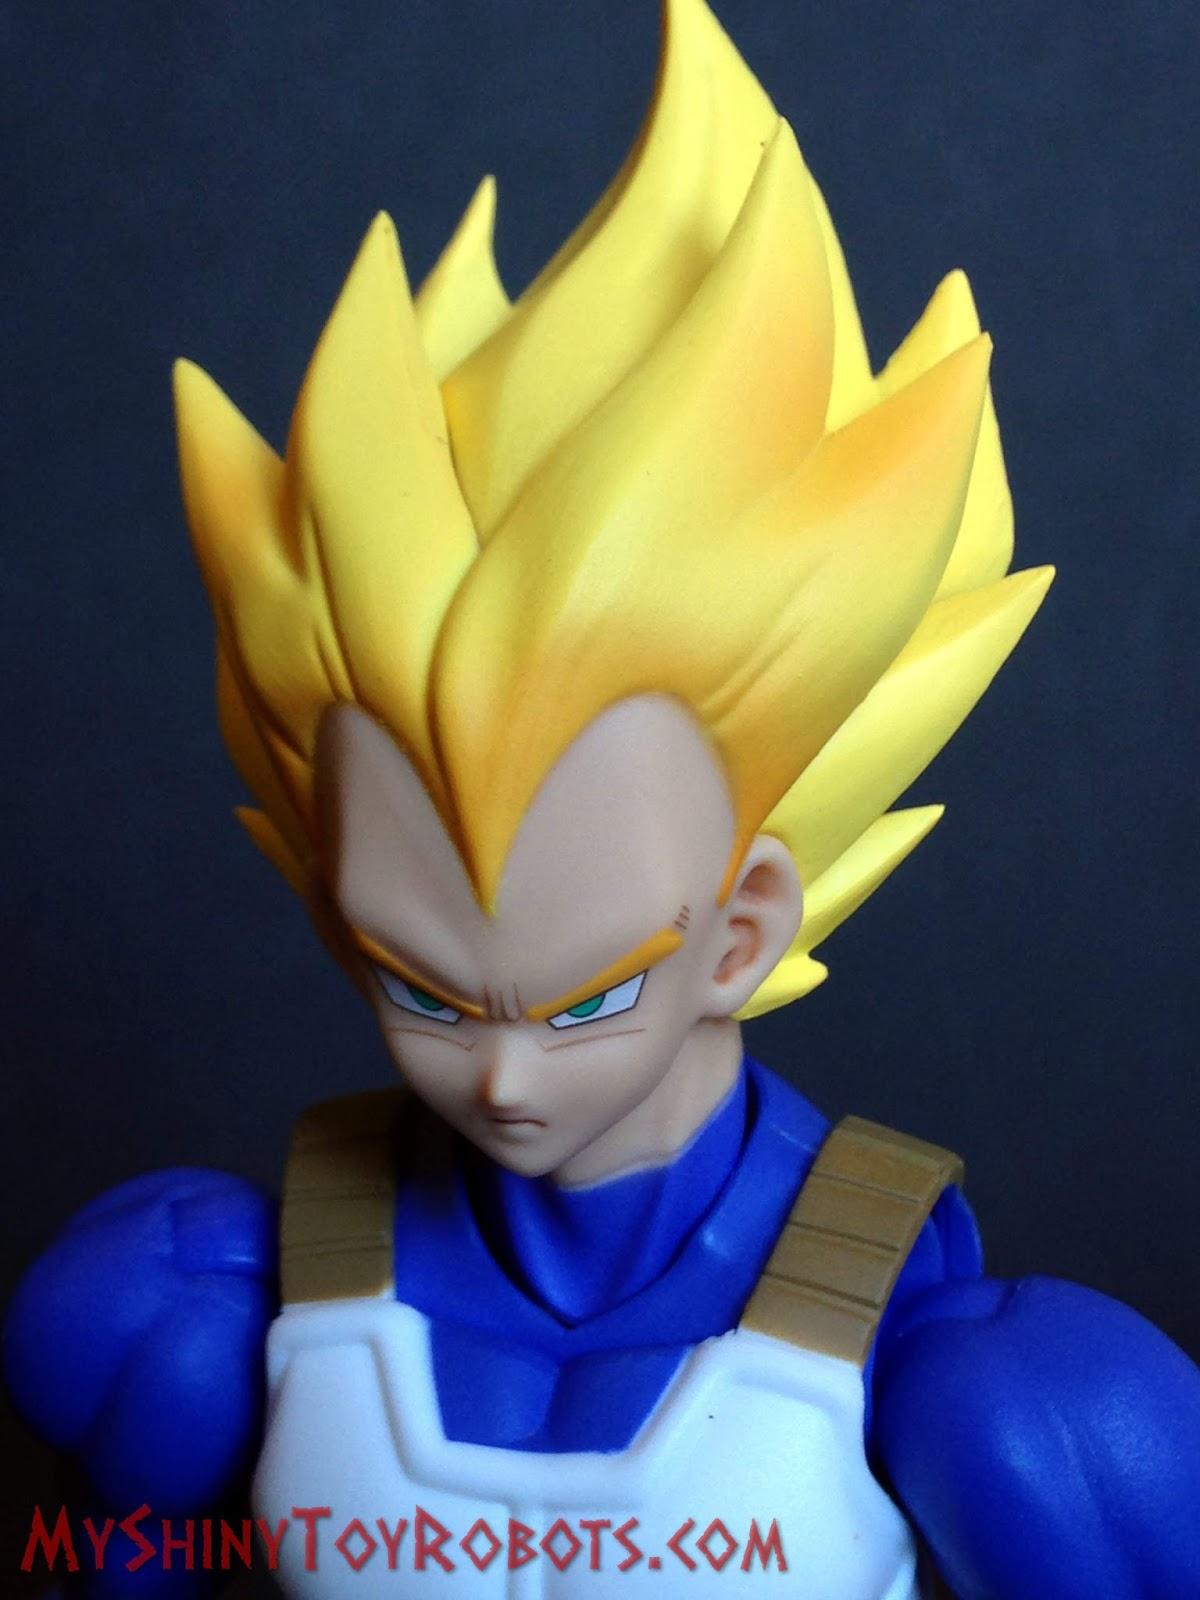 Dragon Ba Figuarts Super Saiyan Vegeta Bandai Tamashii Nations S.H Cell Saga